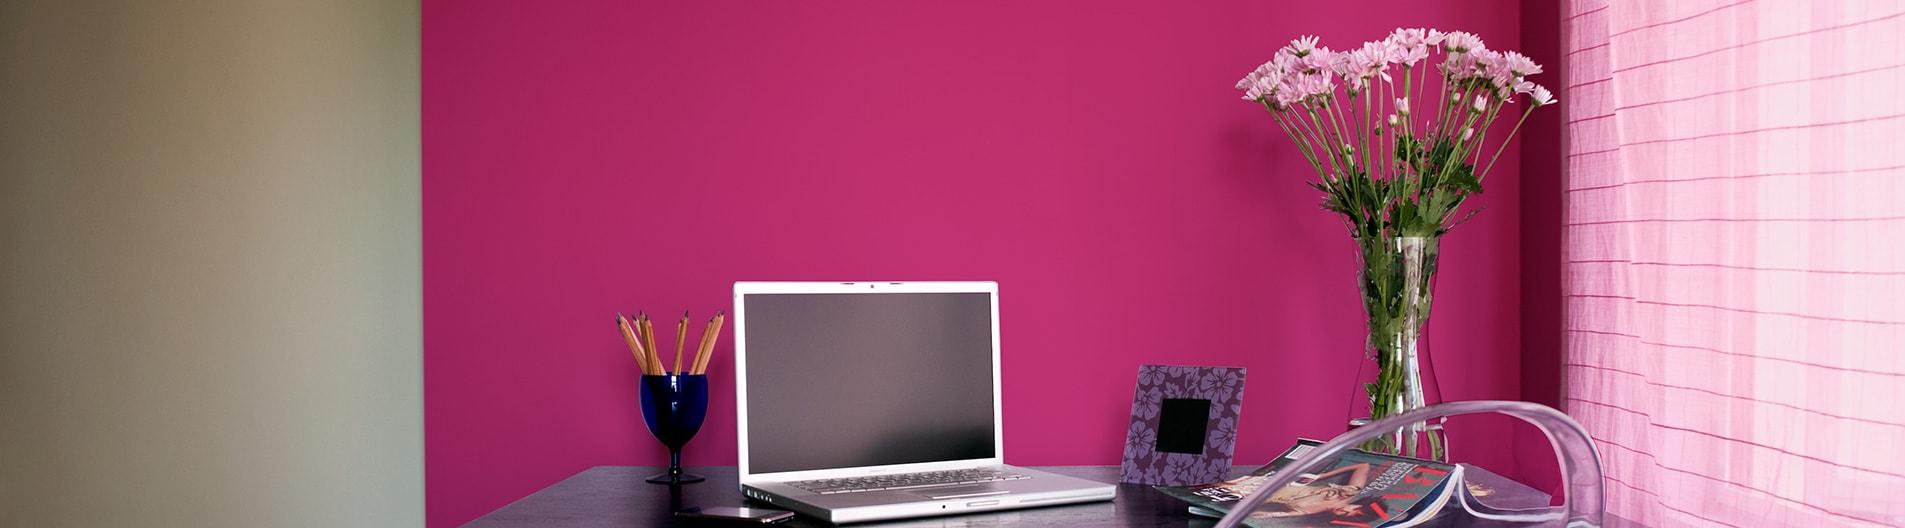 asian paints acrylic colour shades photo - 7